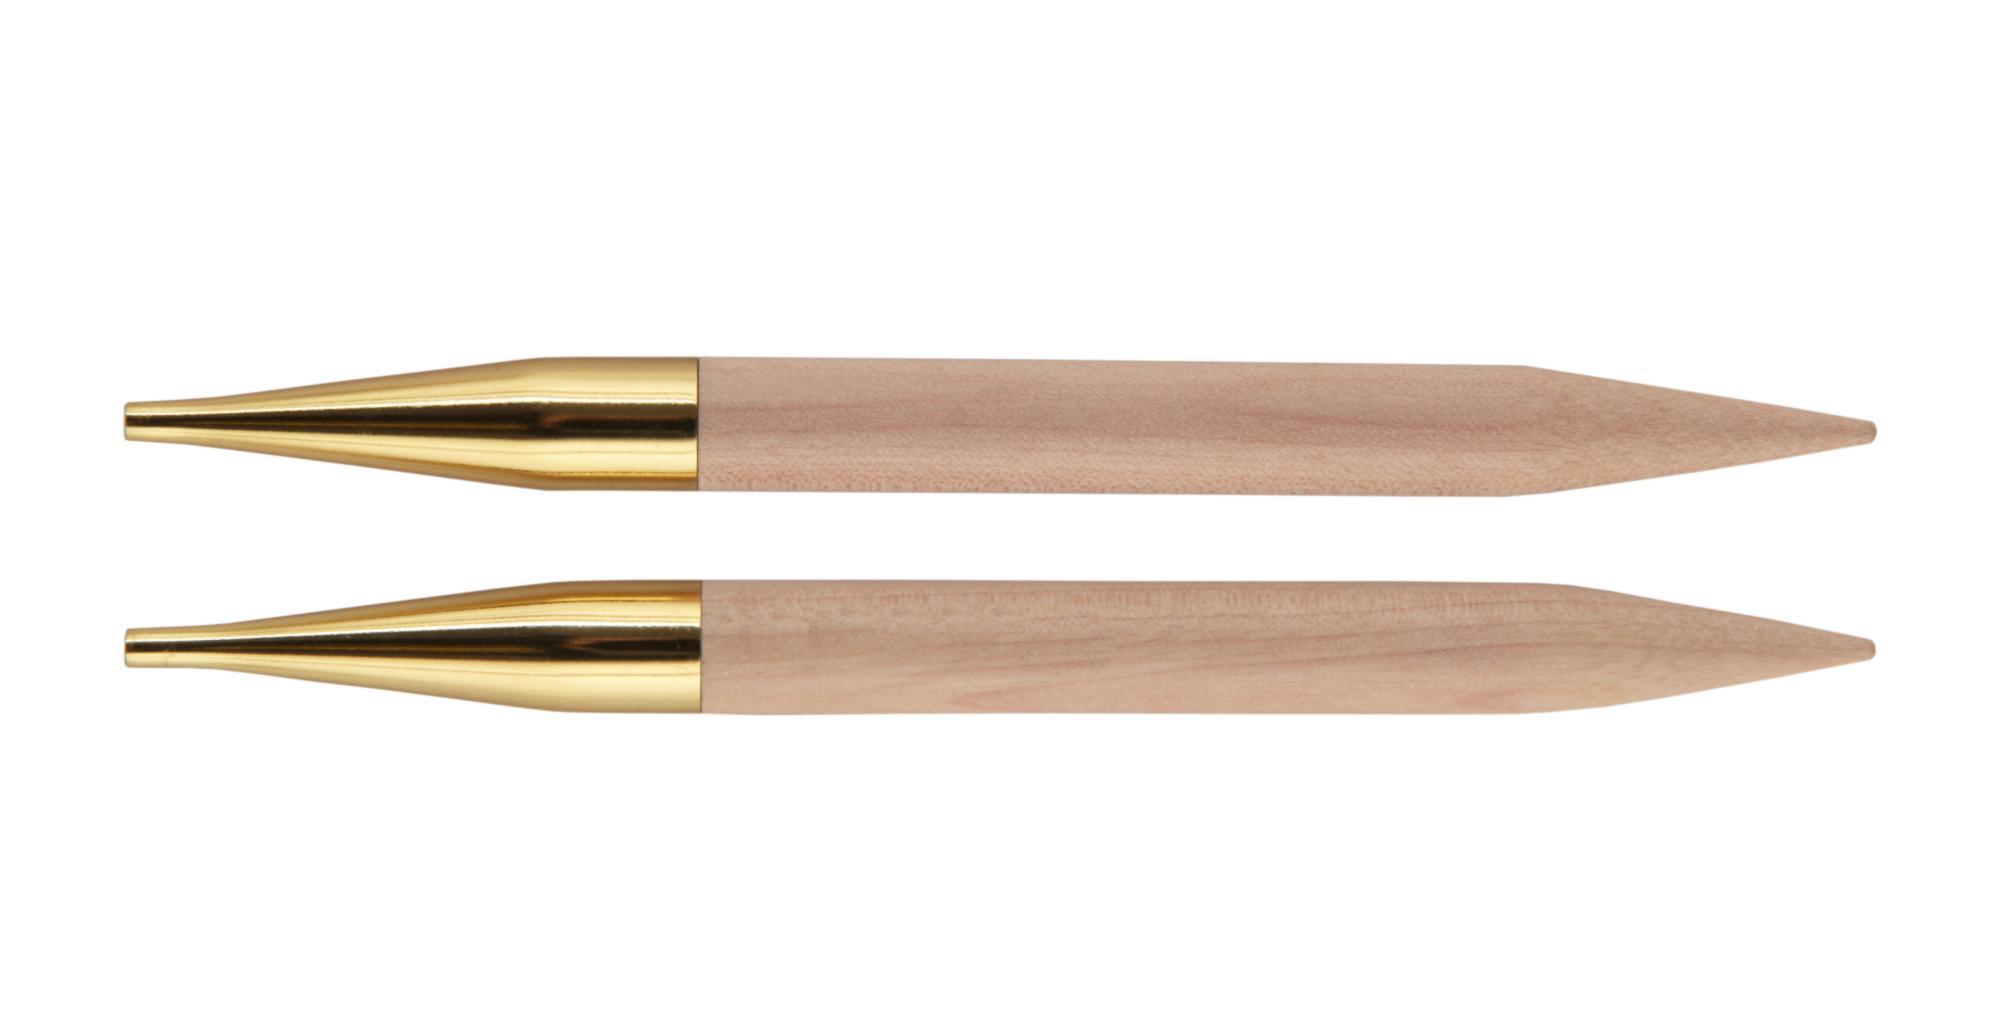 Спицы съемные Basix Birch Wood KnitPro, 35645, 12.00 мм